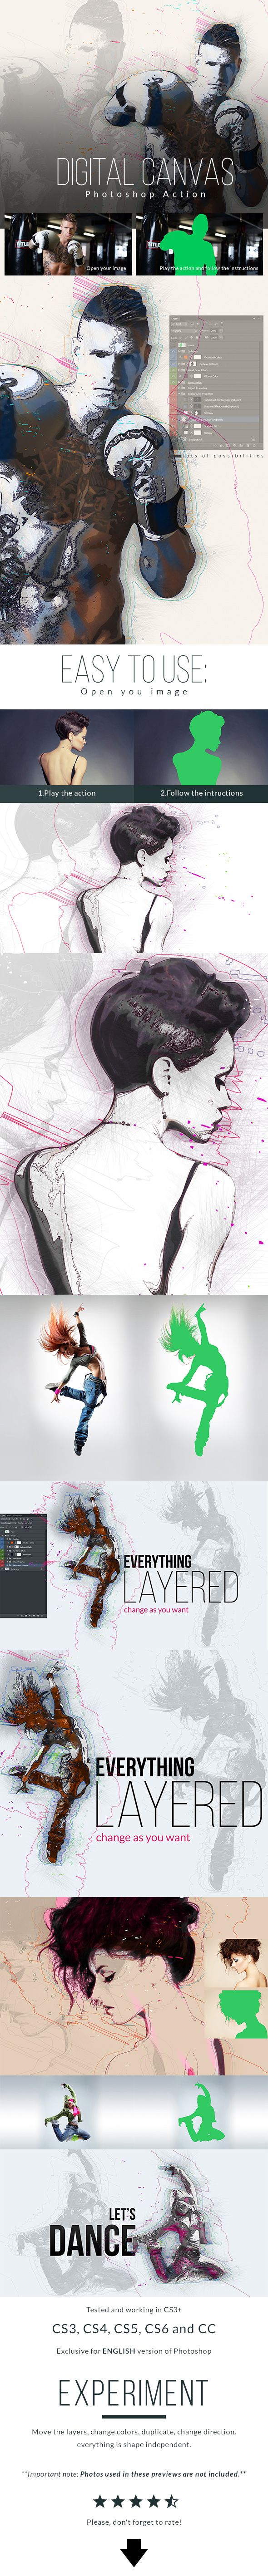 Digital Canvas Photoshop Action - Actions Photoshop